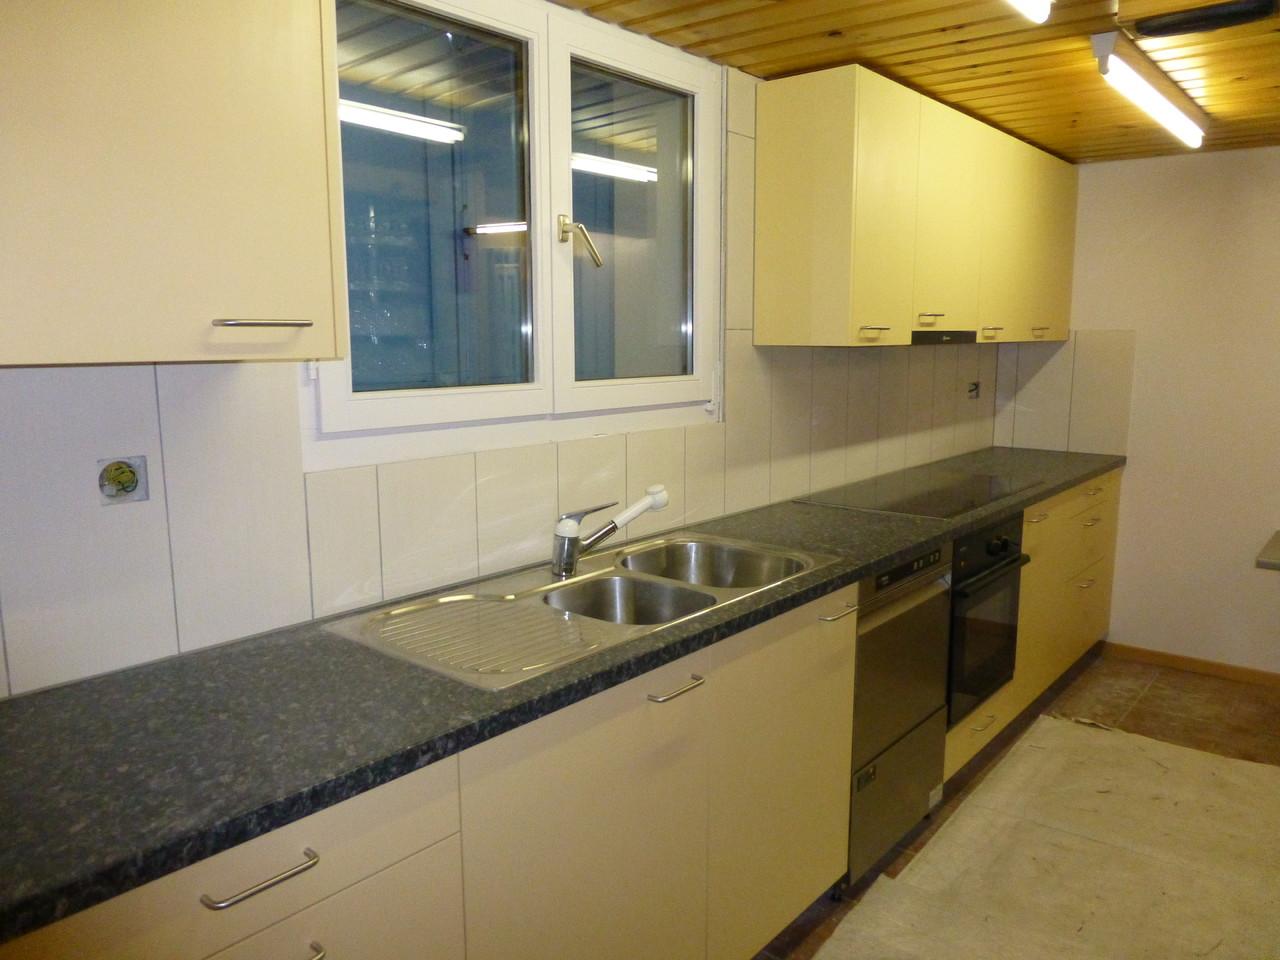 Küche Kleinkaliberschützen Mauensee